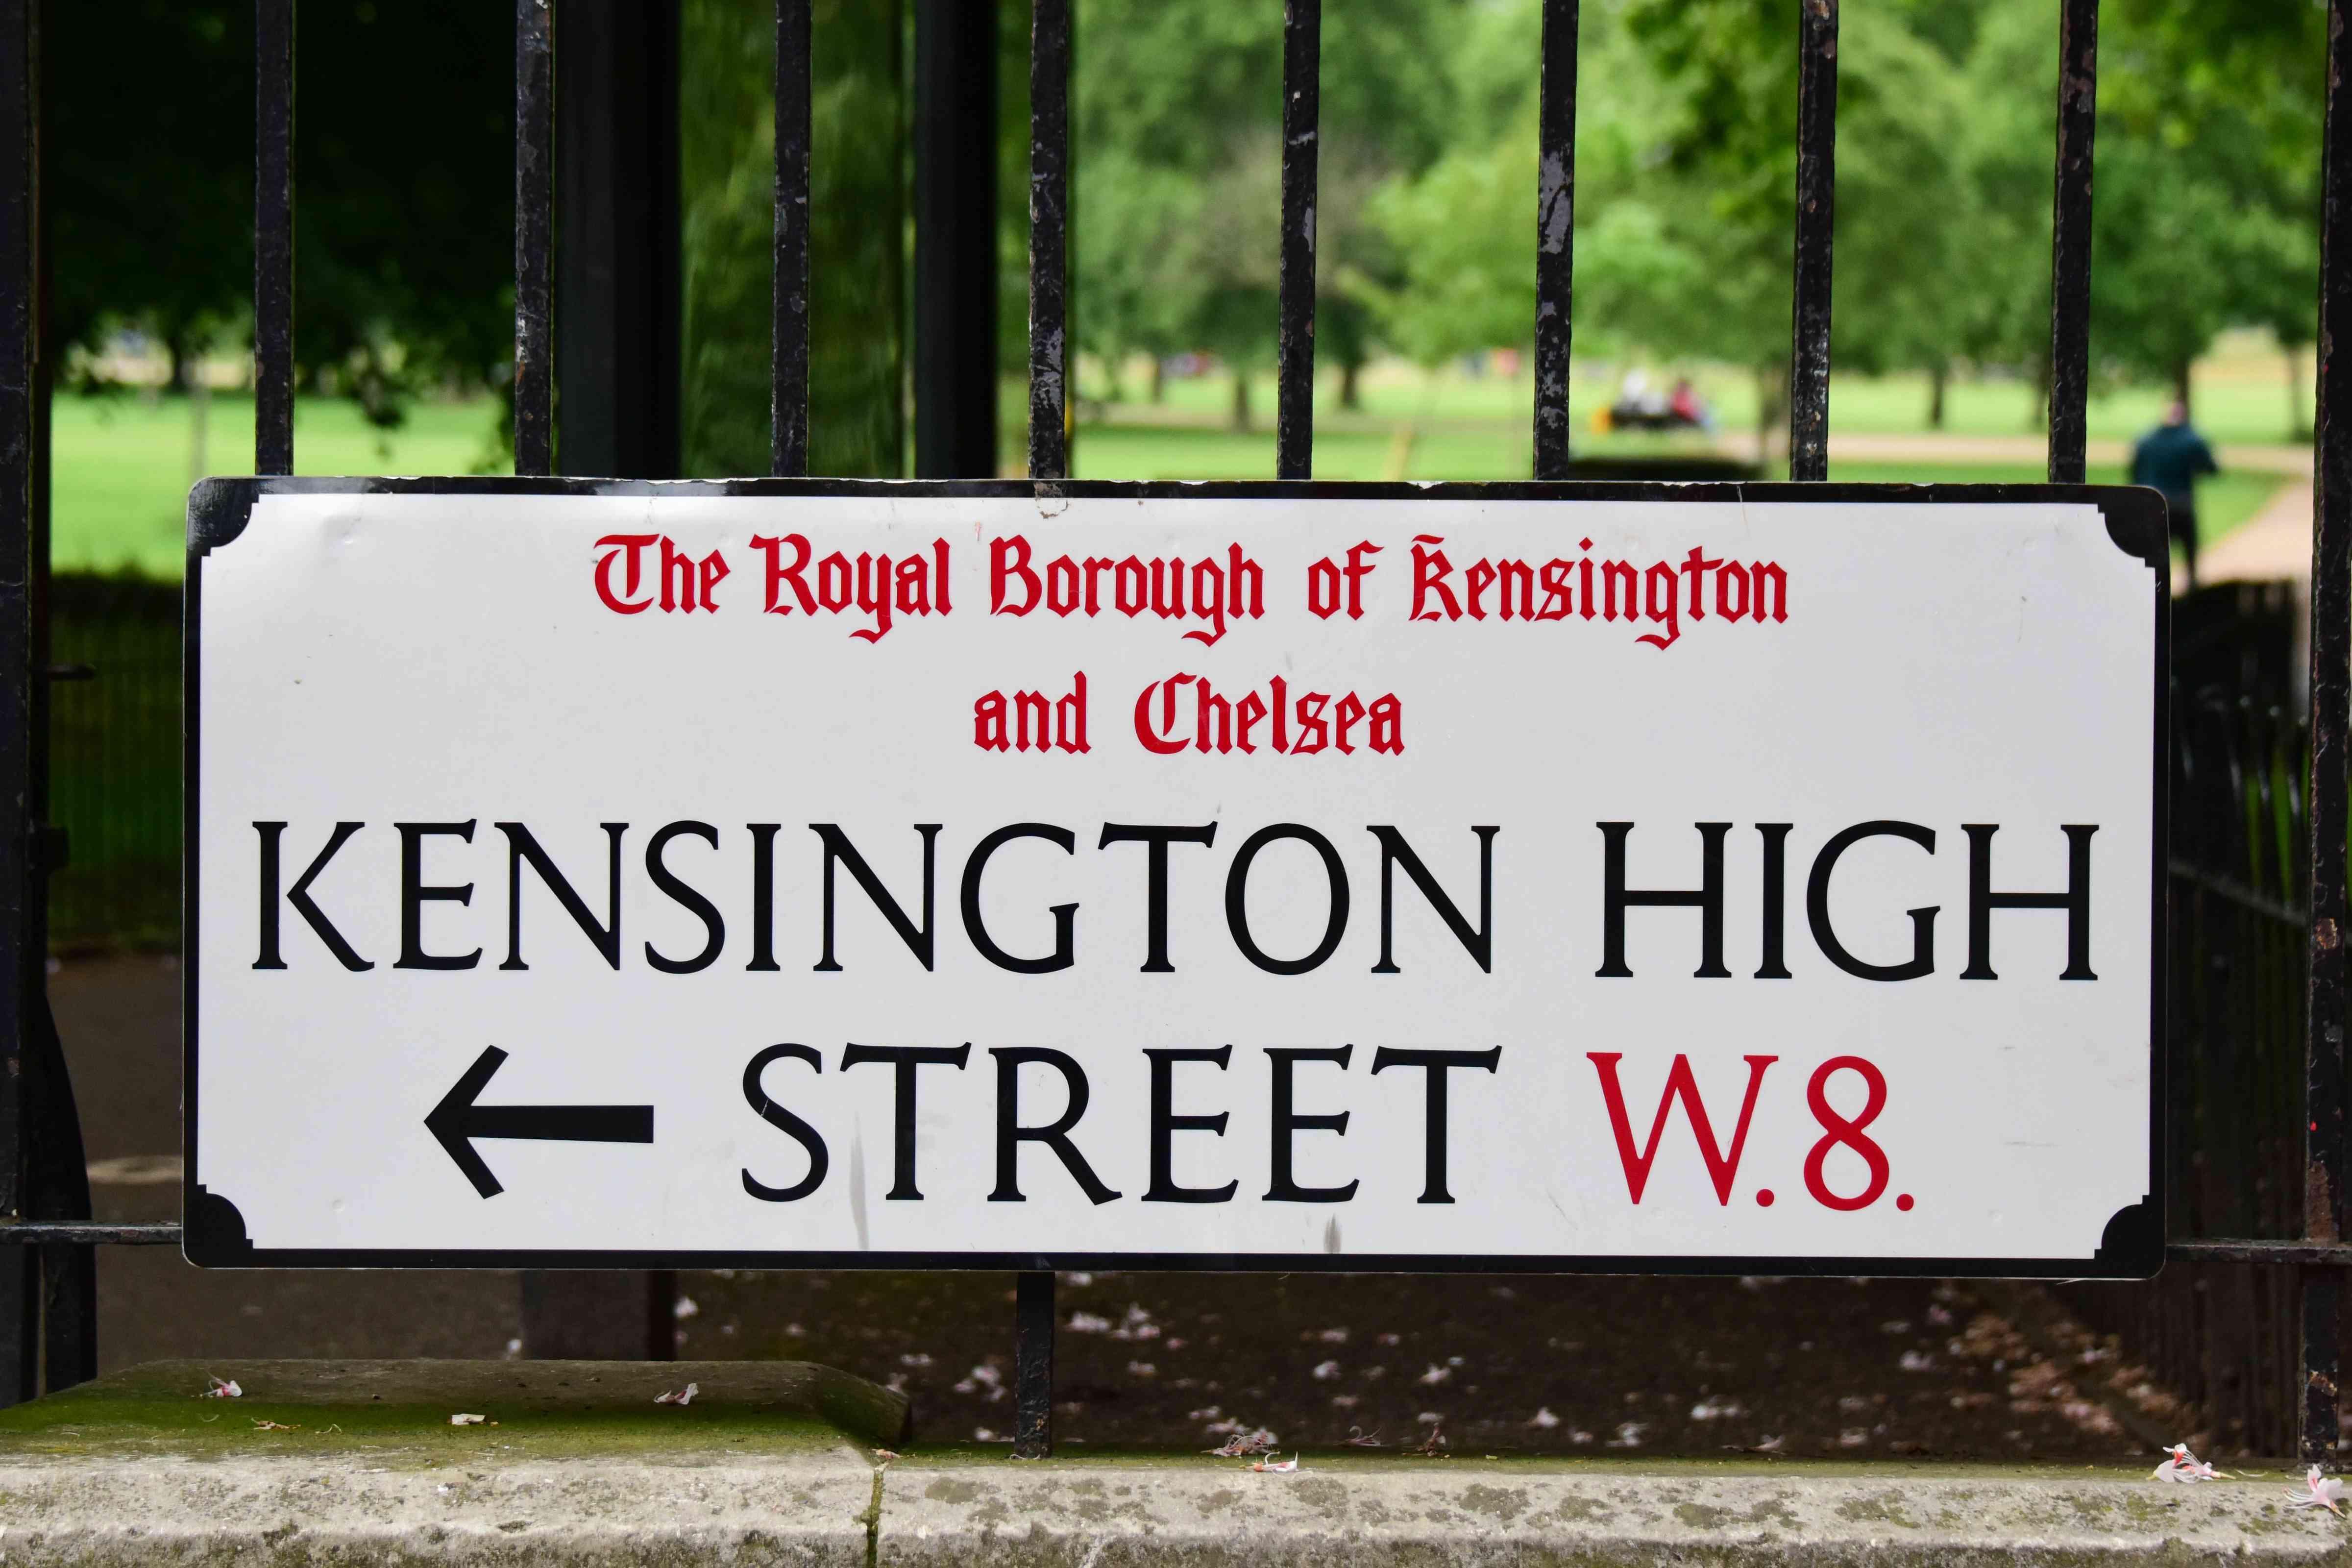 Kensington High Street sign